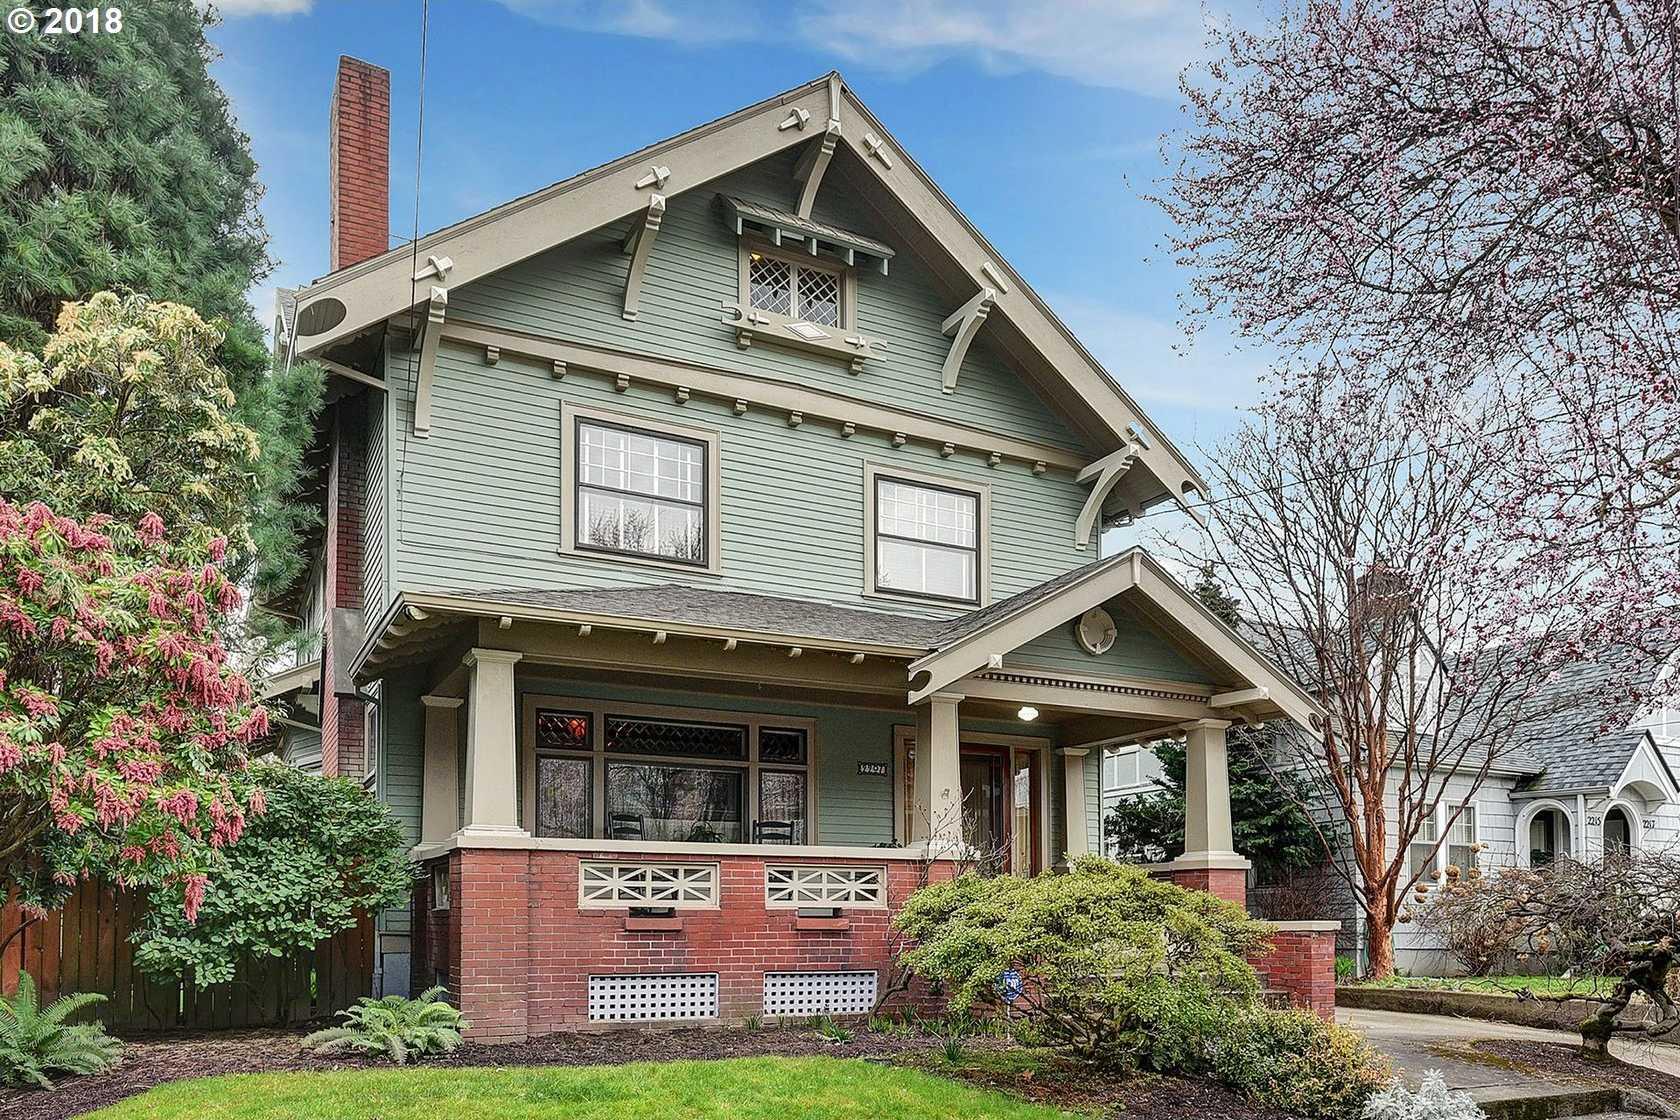 $1,100,000 - 4Br/3Ba -  for Sale in Irvington, Portland